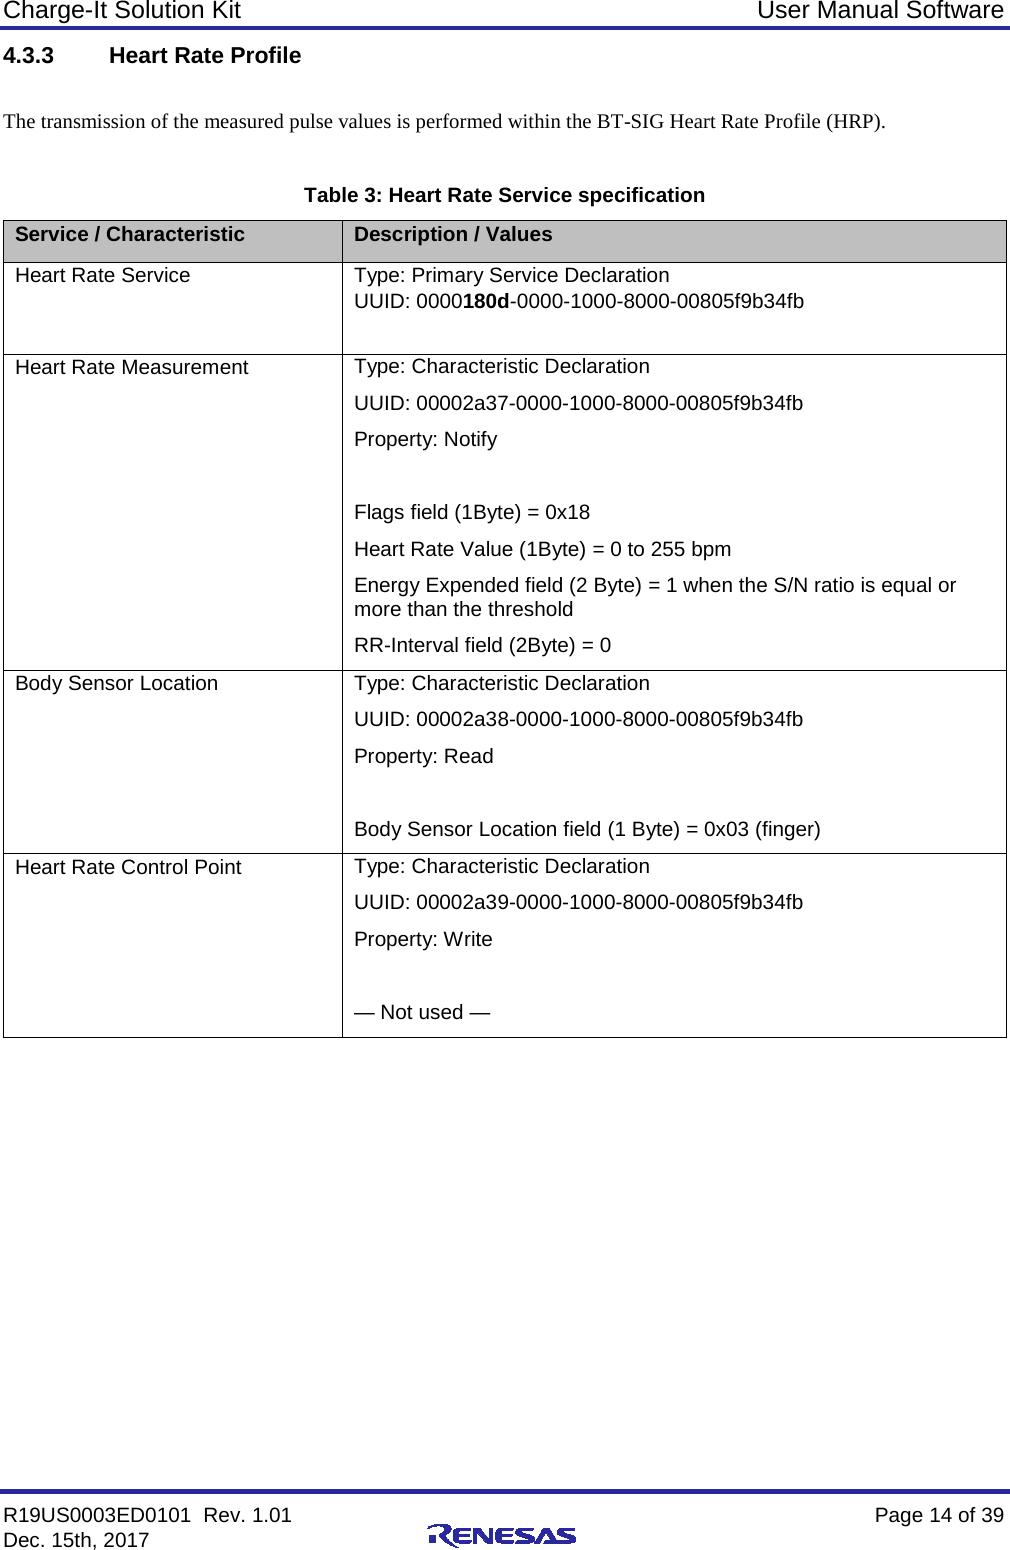 Renesas Electronics Europe CHARGE-IT Evaluation Board User